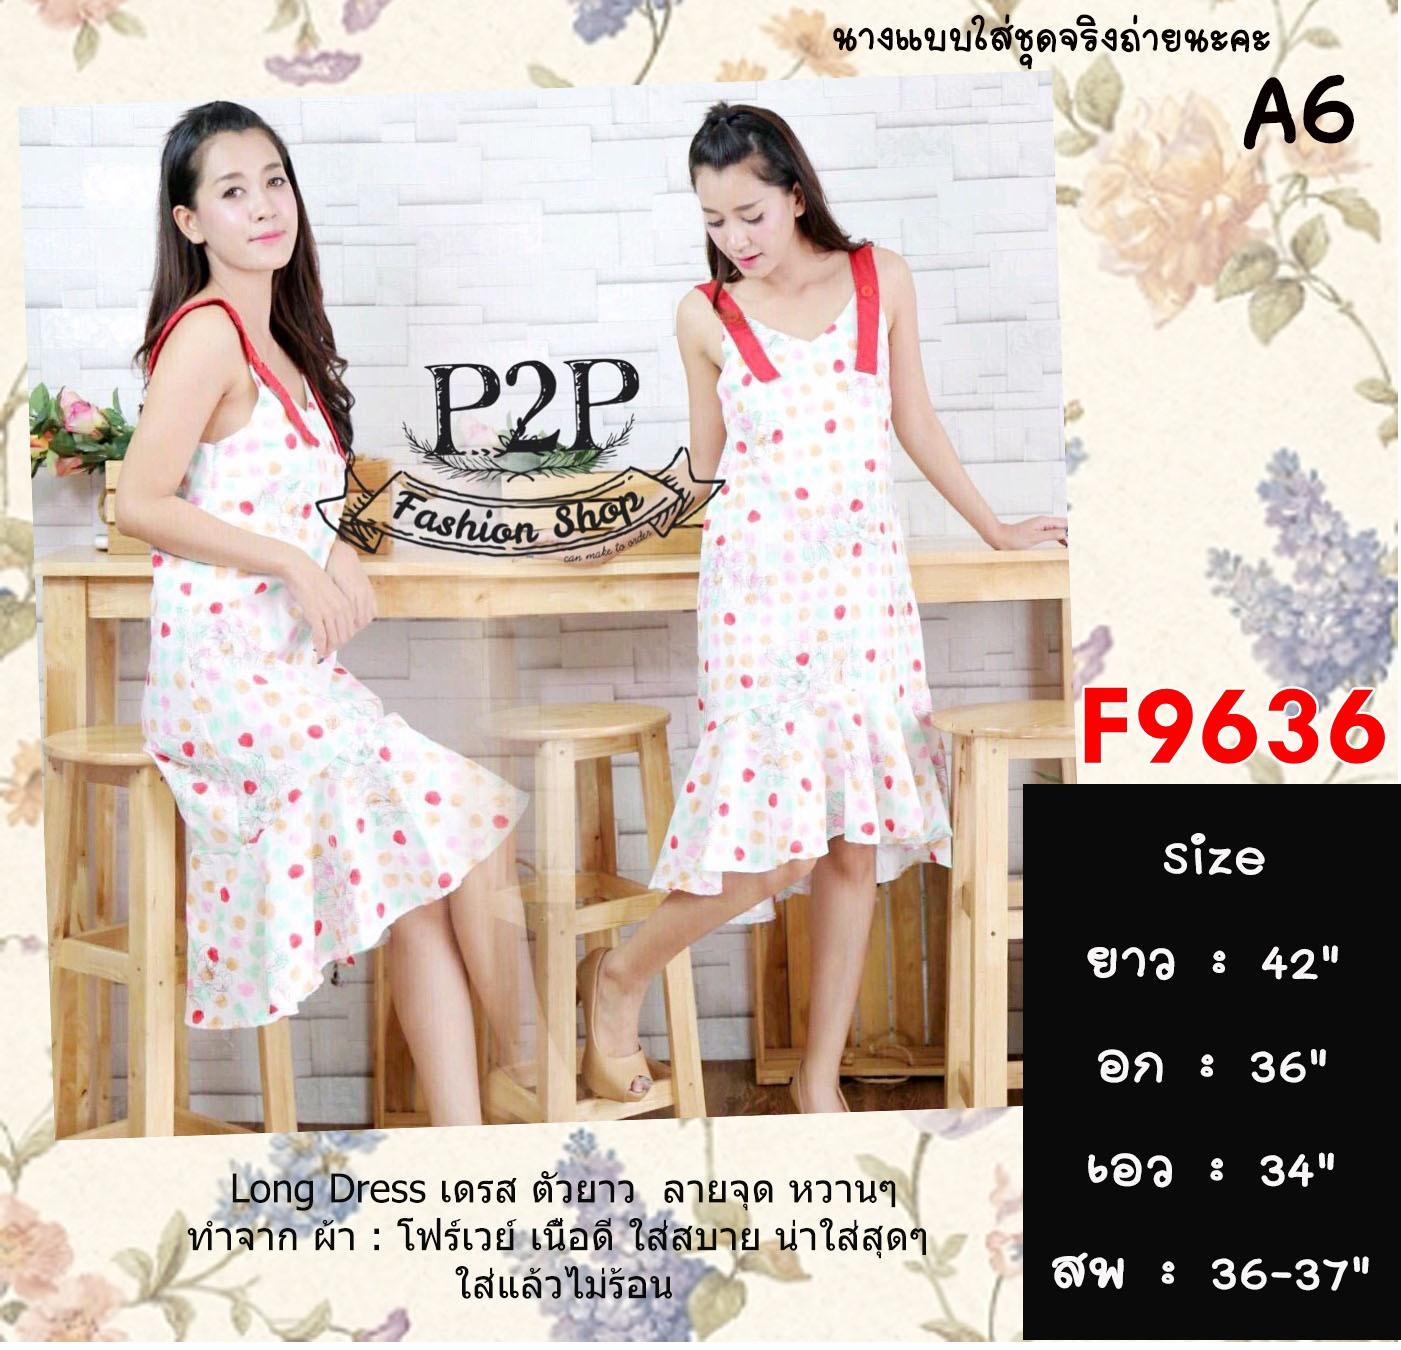 F9636 Long dress เดรสตัวยาว ลายจุด สีแดง